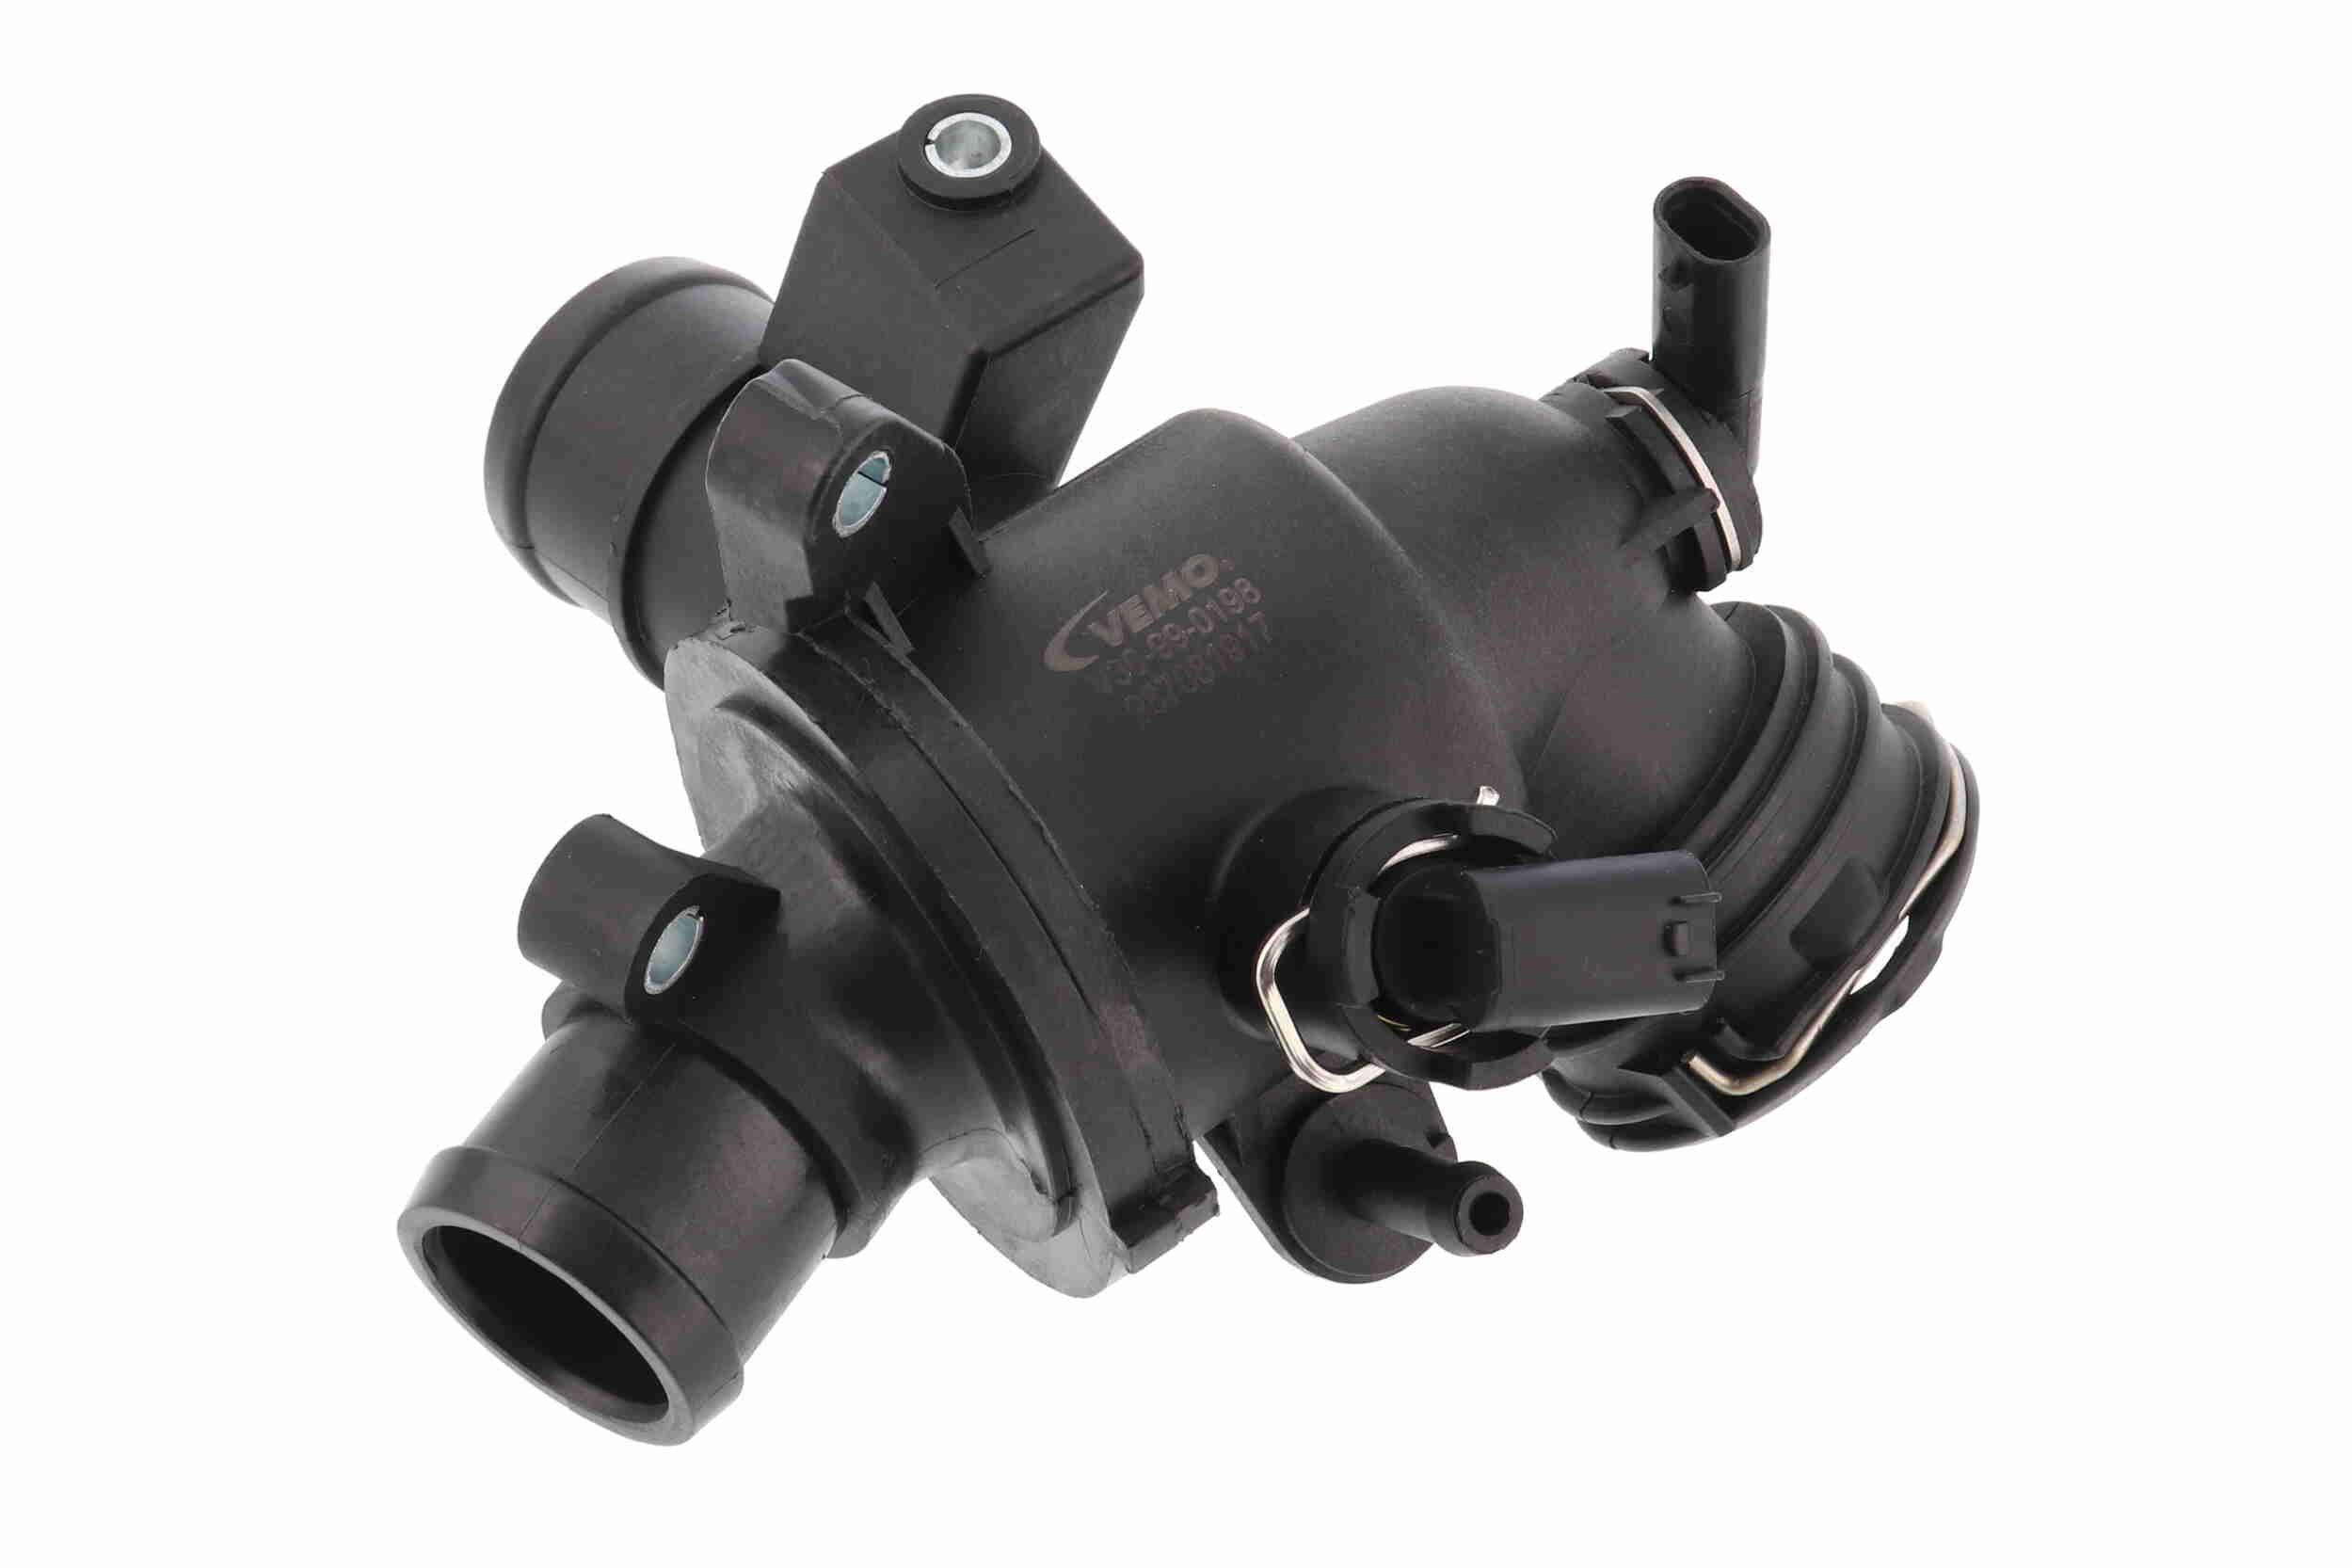 V30-99-0198 VEMO Öffnungstemperatur: 95°C, mit Dichtung, mit Sensor, mit Thermostat, Kunststoffgehäuse, Original VEMO Qualität Thermostat, Kühlmittel V30-99-0198 günstig kaufen